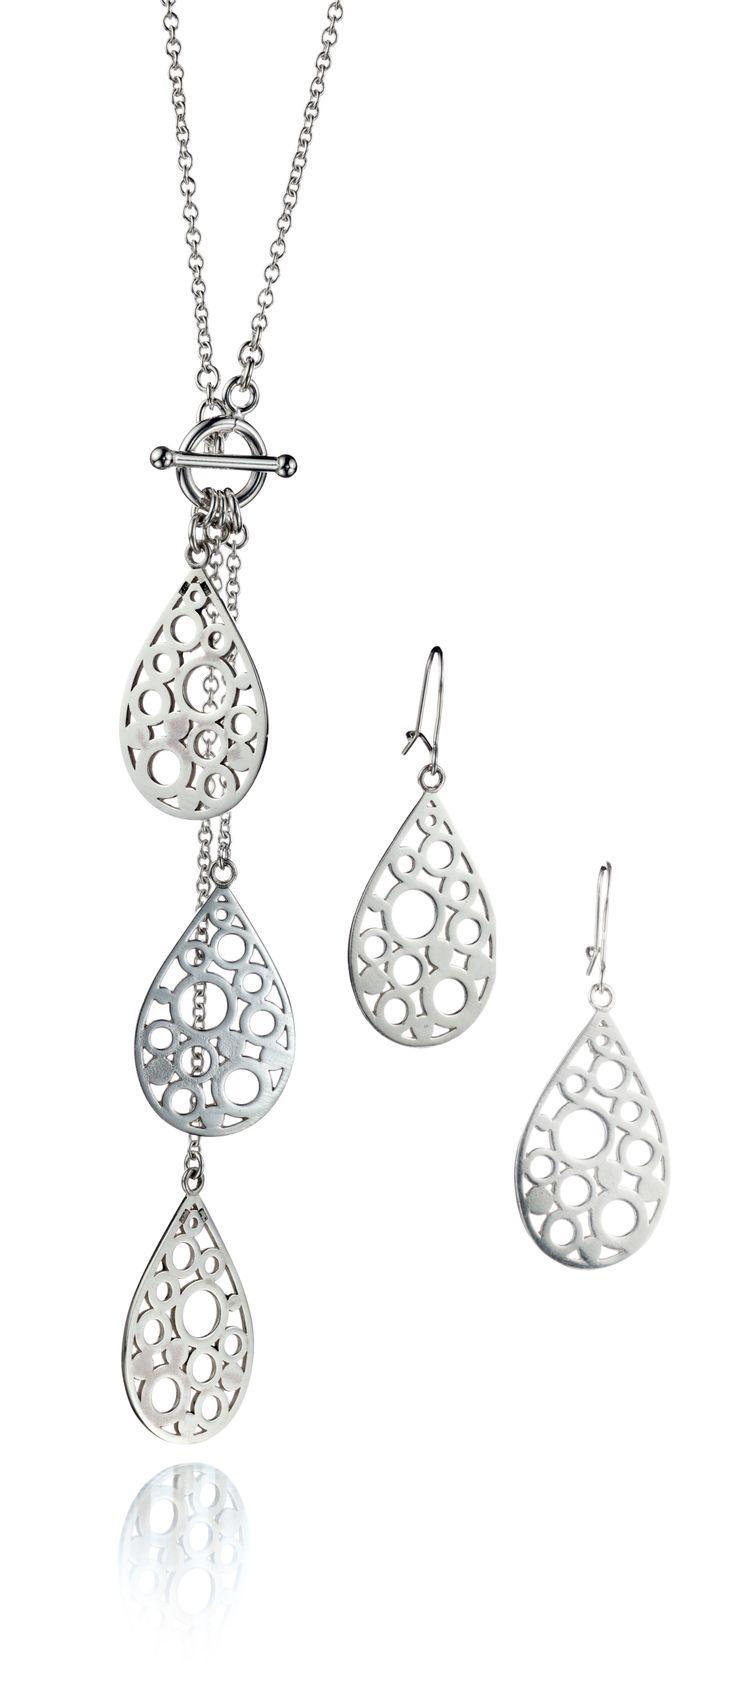 Carina Blomqvist, Sara earrings and necklace, http://www.carinablomqvist.fi/